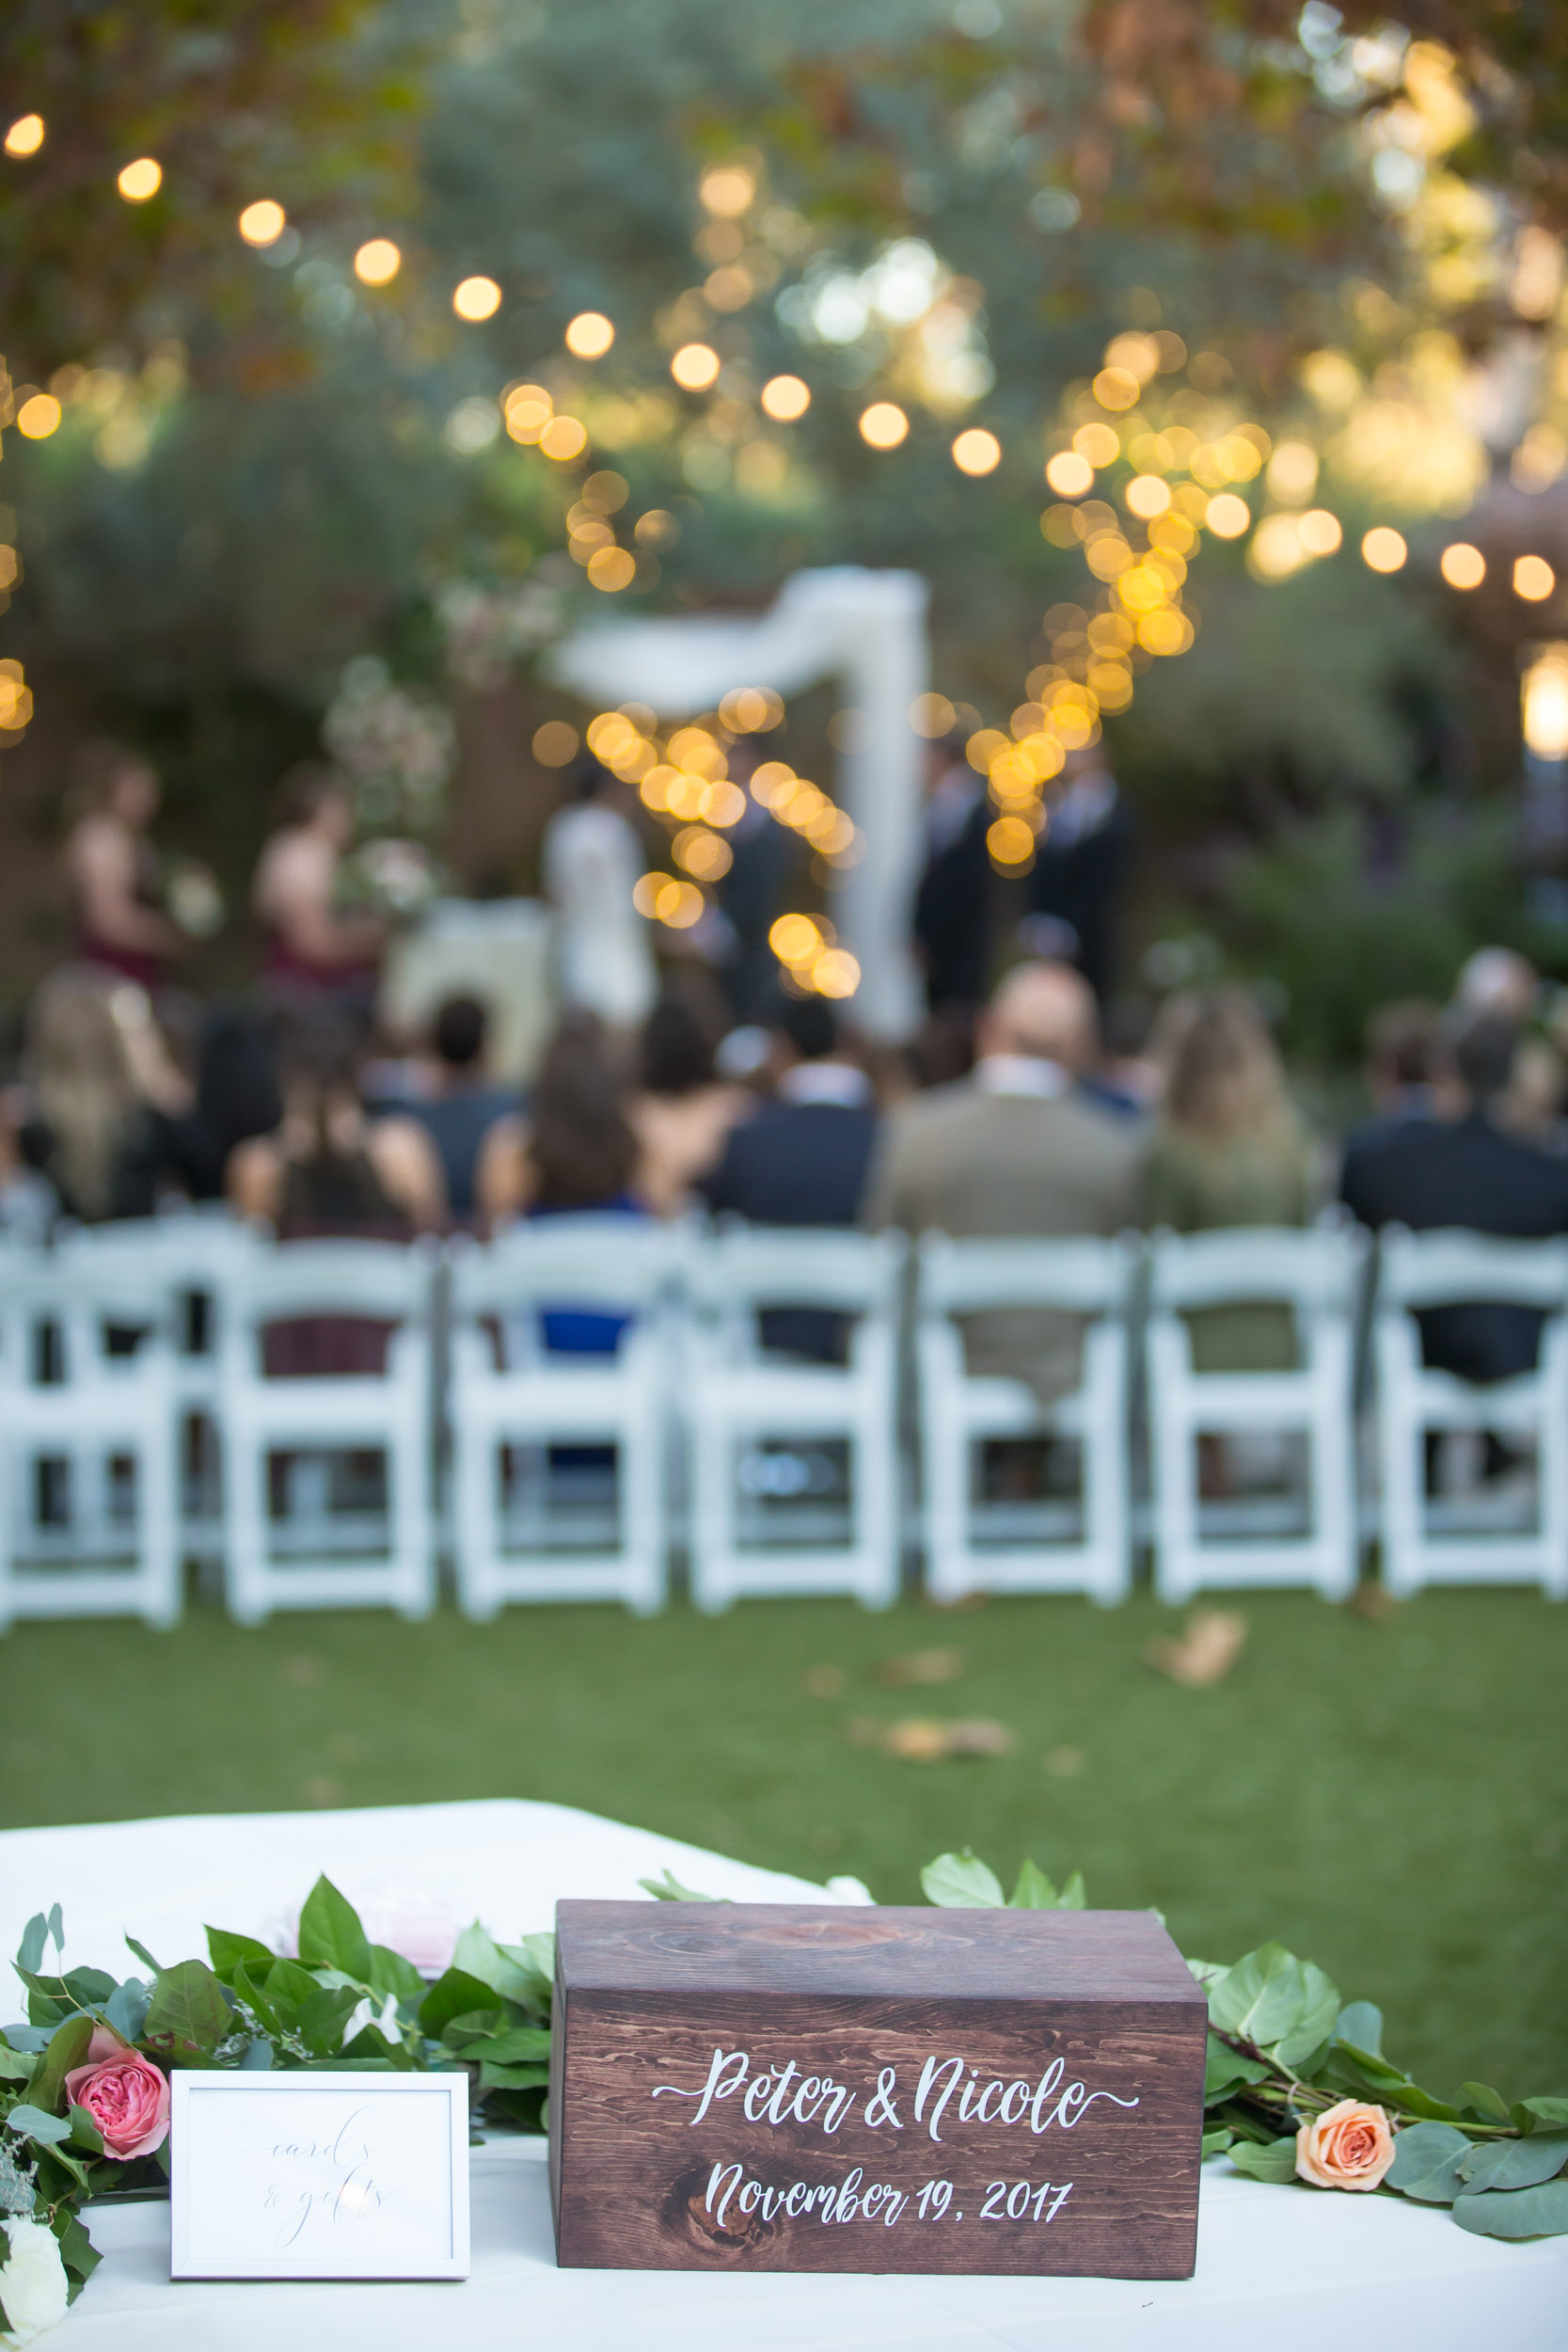 THE WEDDING OF PETER & NICOLE-595.jpg